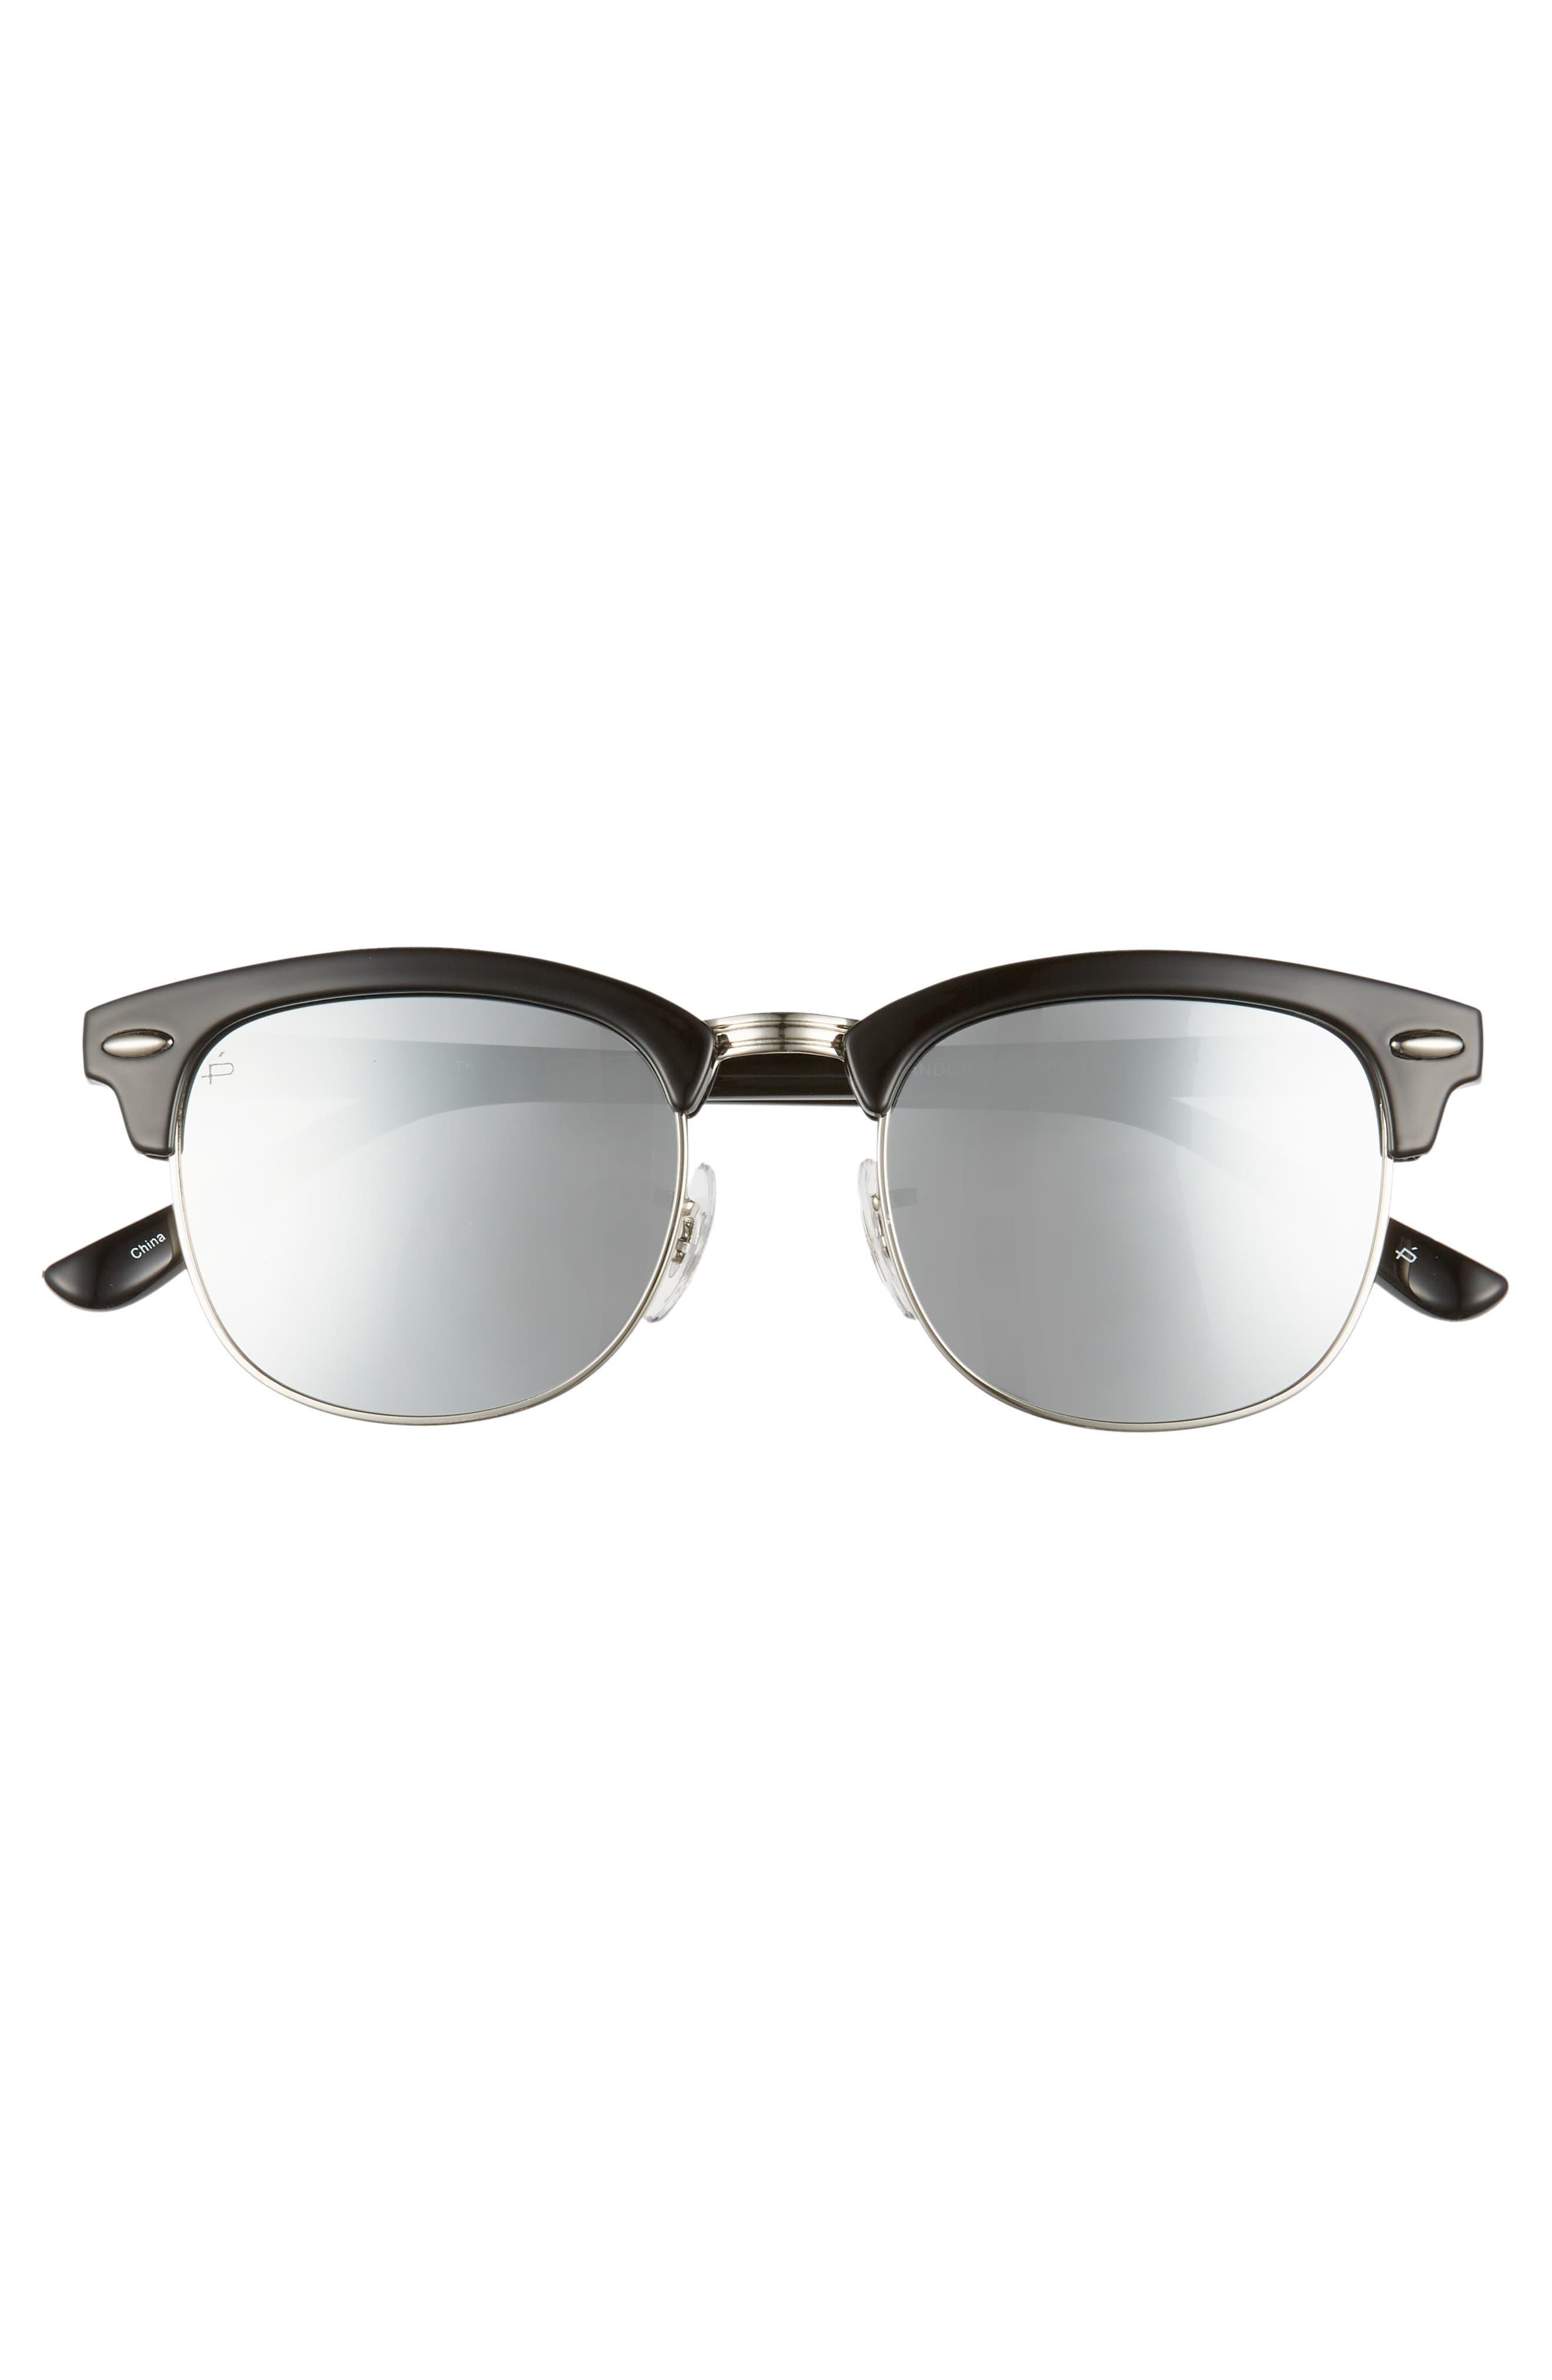 Privé Revaux The Chairman 52mm Polarized Browline Sunglasses,                             Alternate thumbnail 3, color,